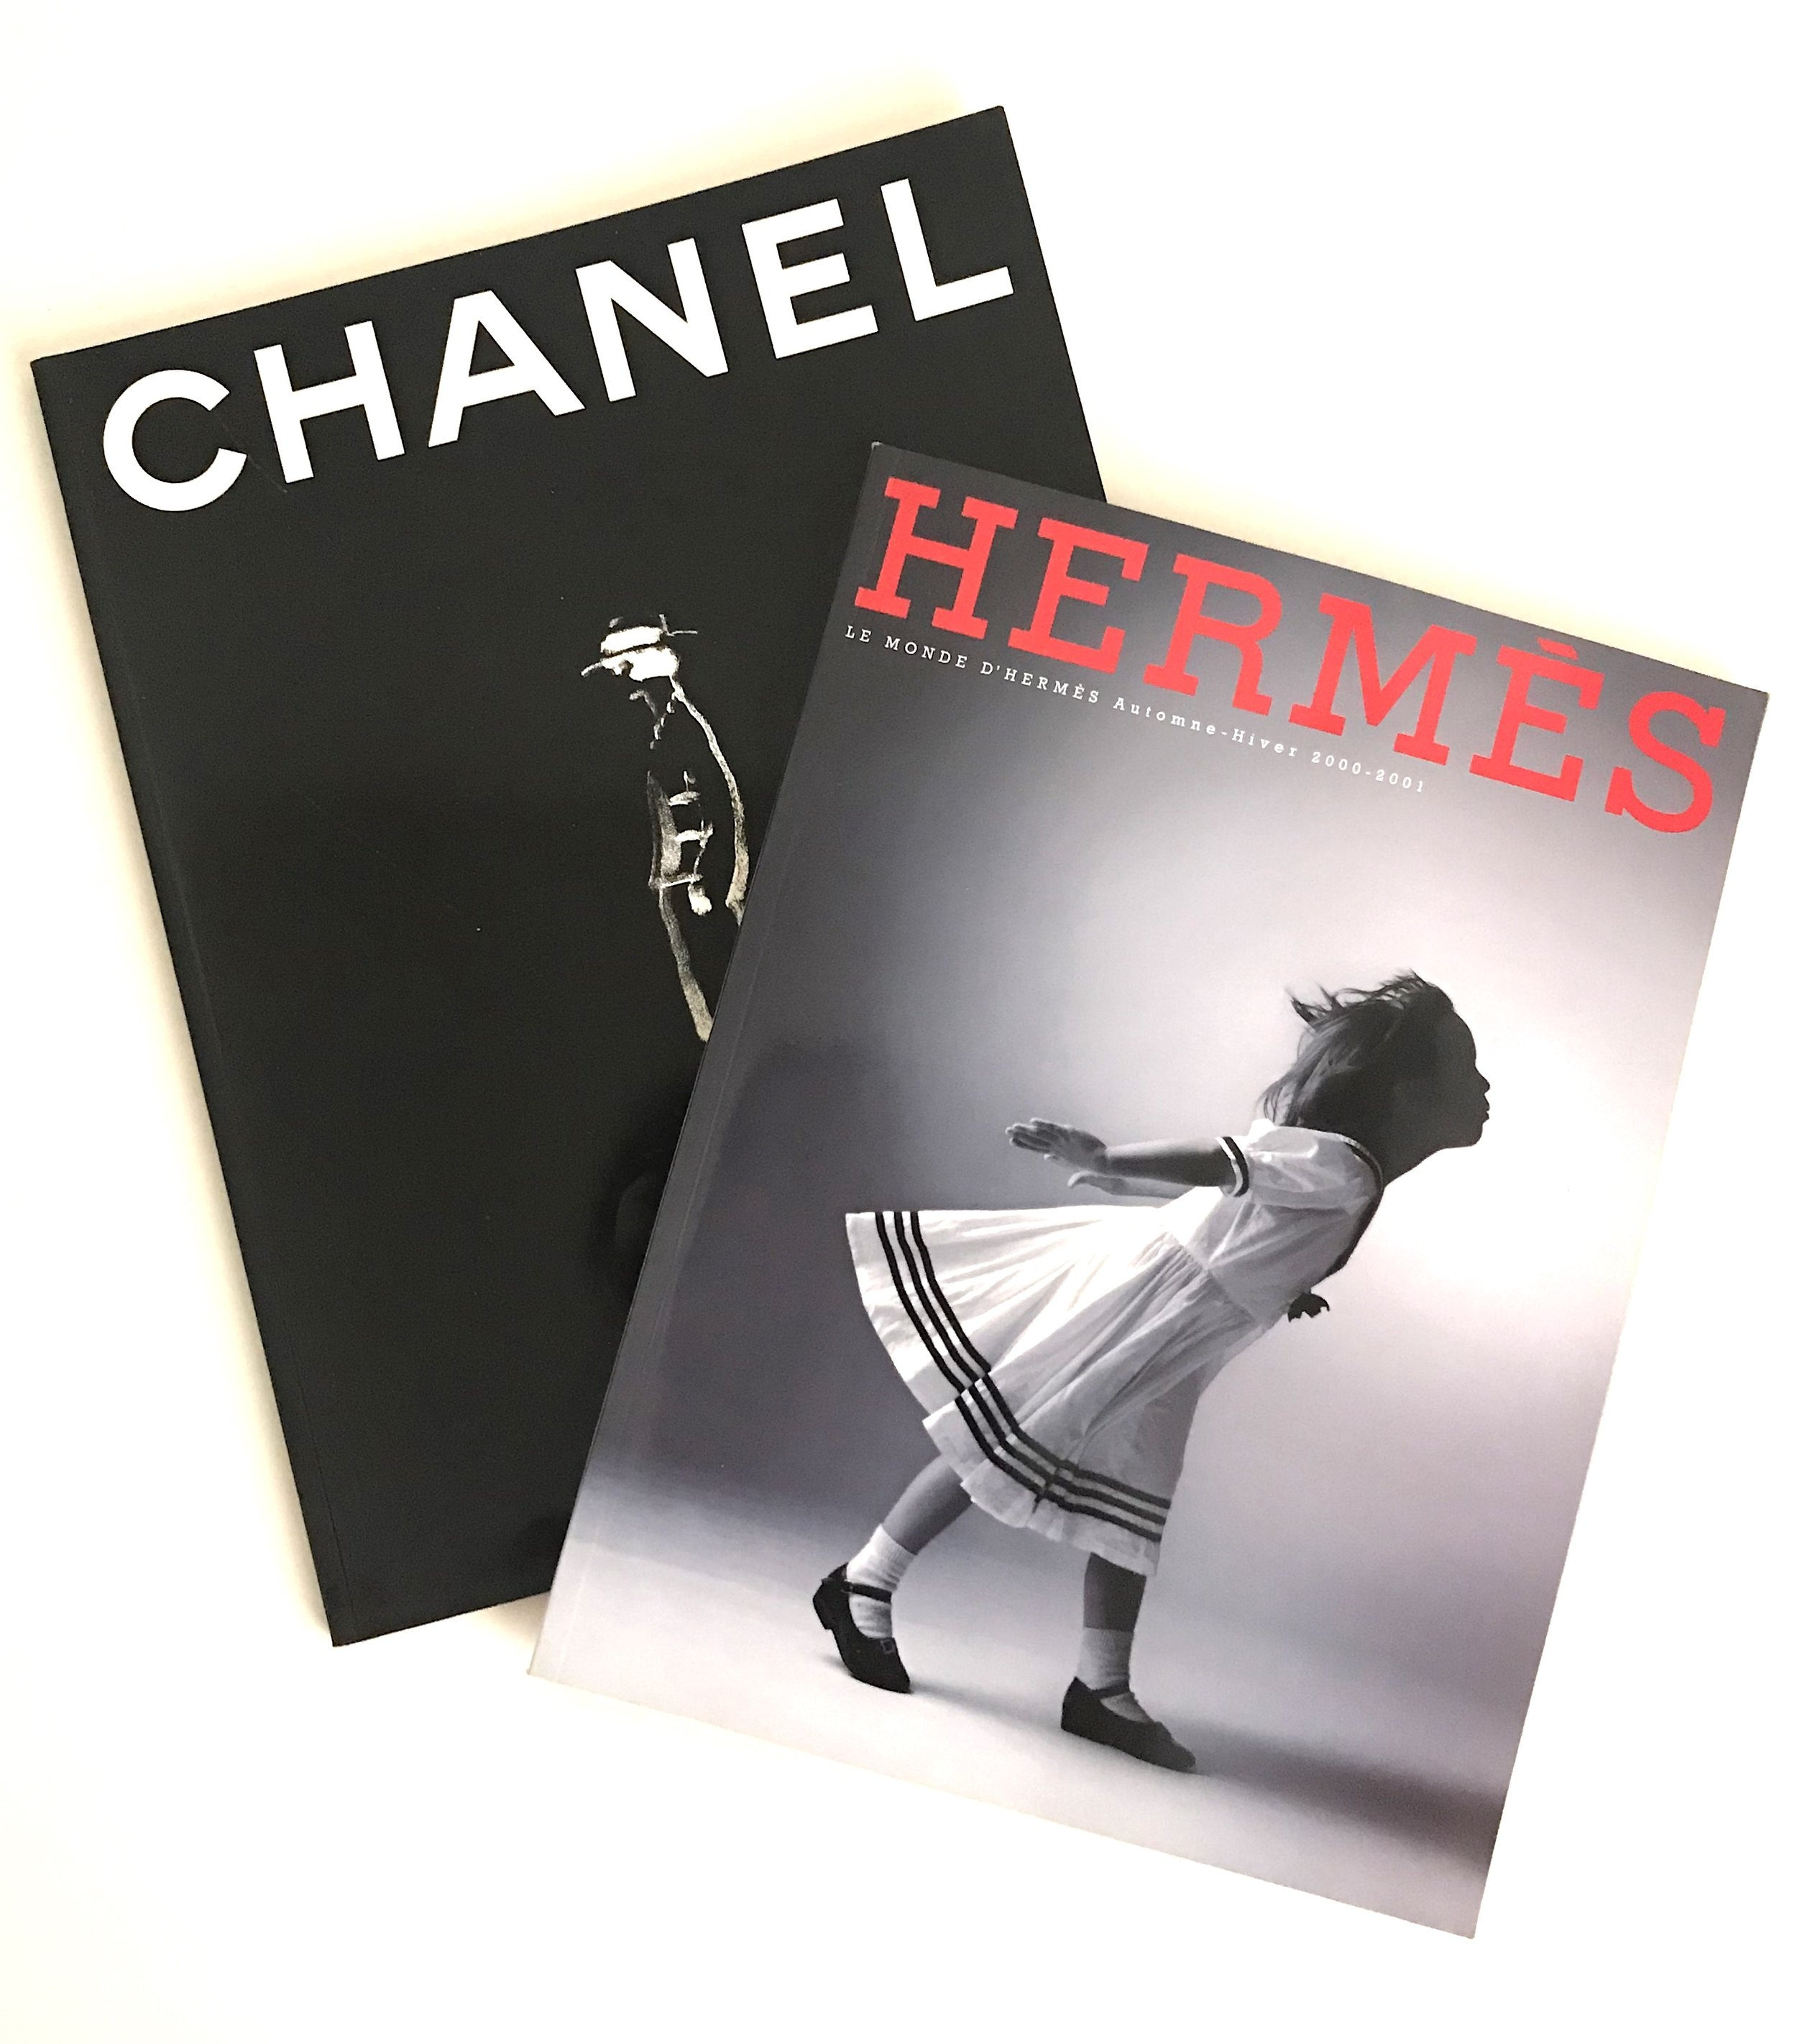 Chanel & Hermes magazines